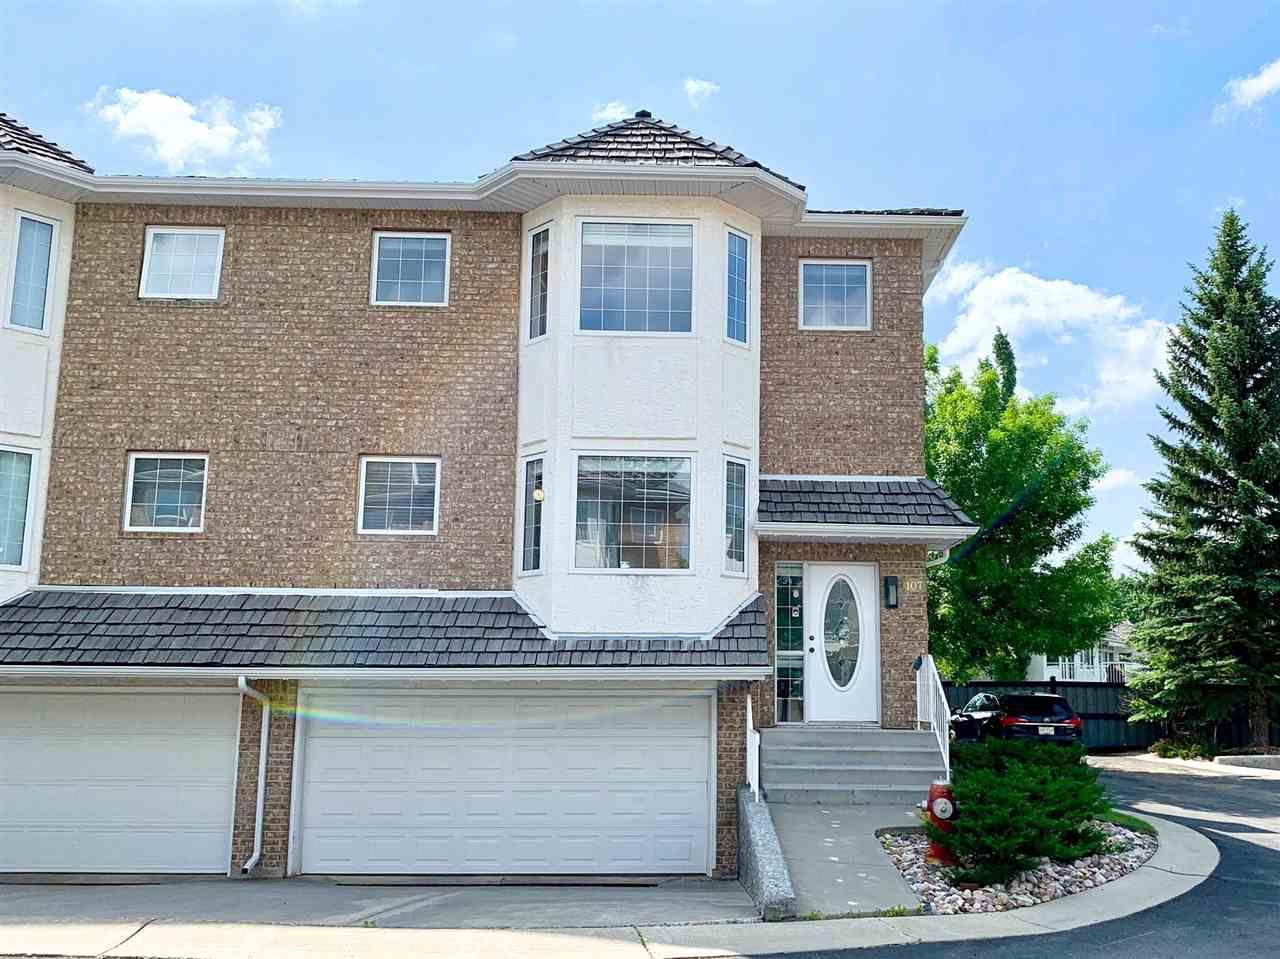 Main Photo: 107 EAGLE RIDGE Place in Edmonton: Zone 14 Townhouse for sale : MLS®# E4152158